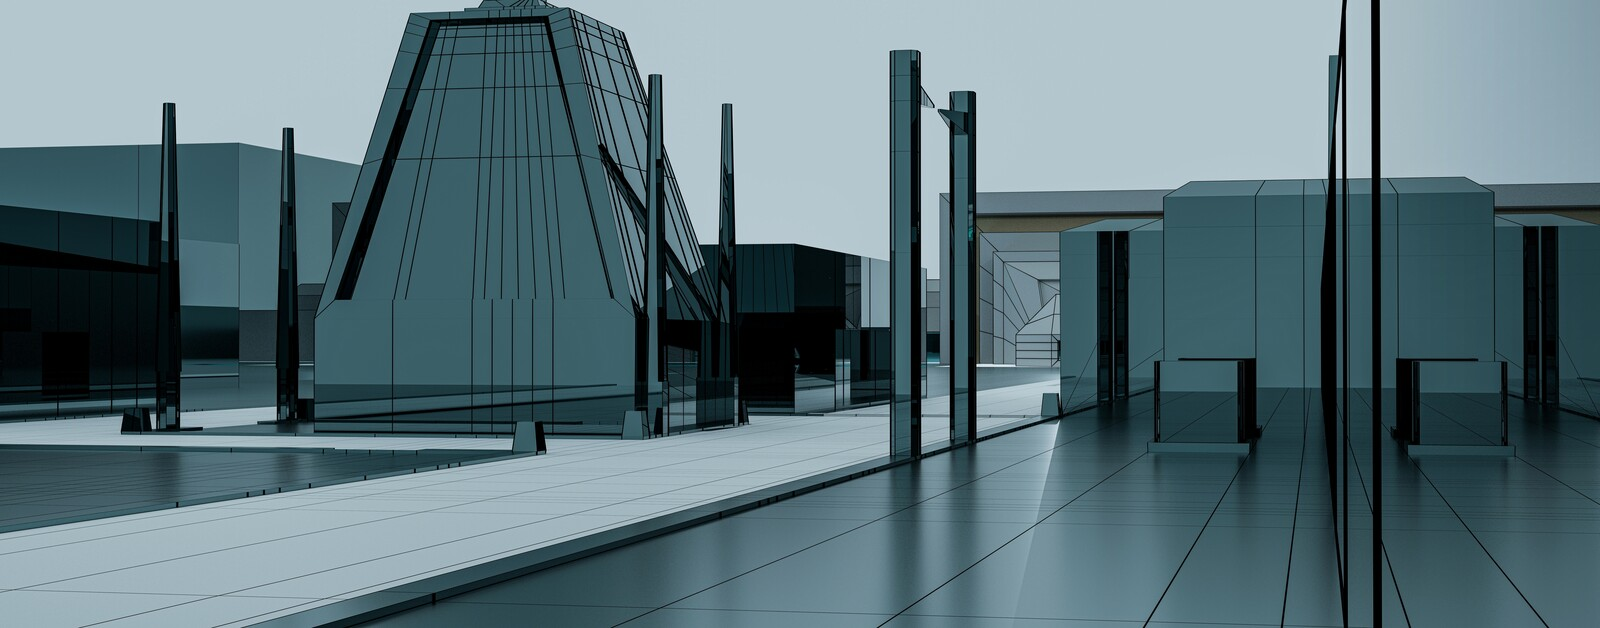 CyberSpace Archviz Architecture